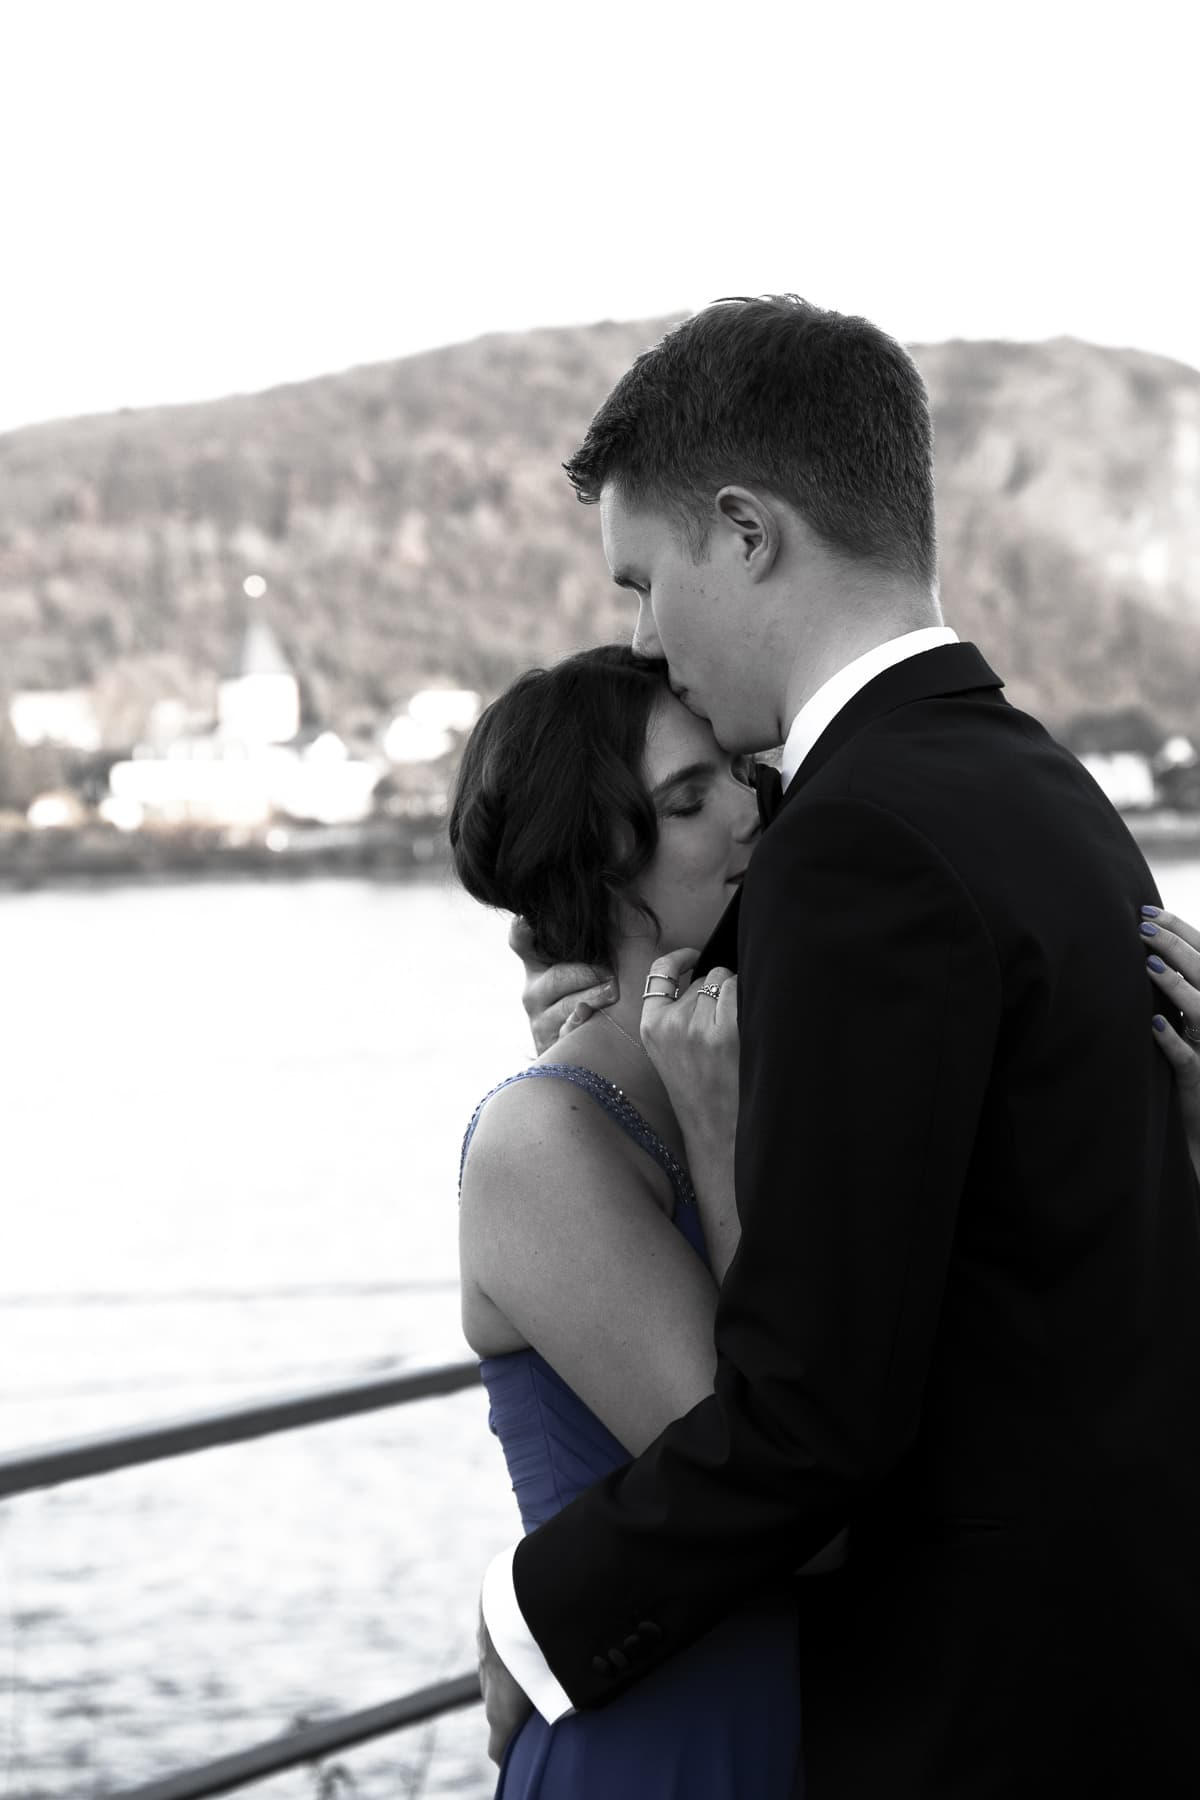 Couple Shooting: Das perfekte Balloutfit mit langem Abendkleid & Smoking - Abschlussball, Abiball, Paar